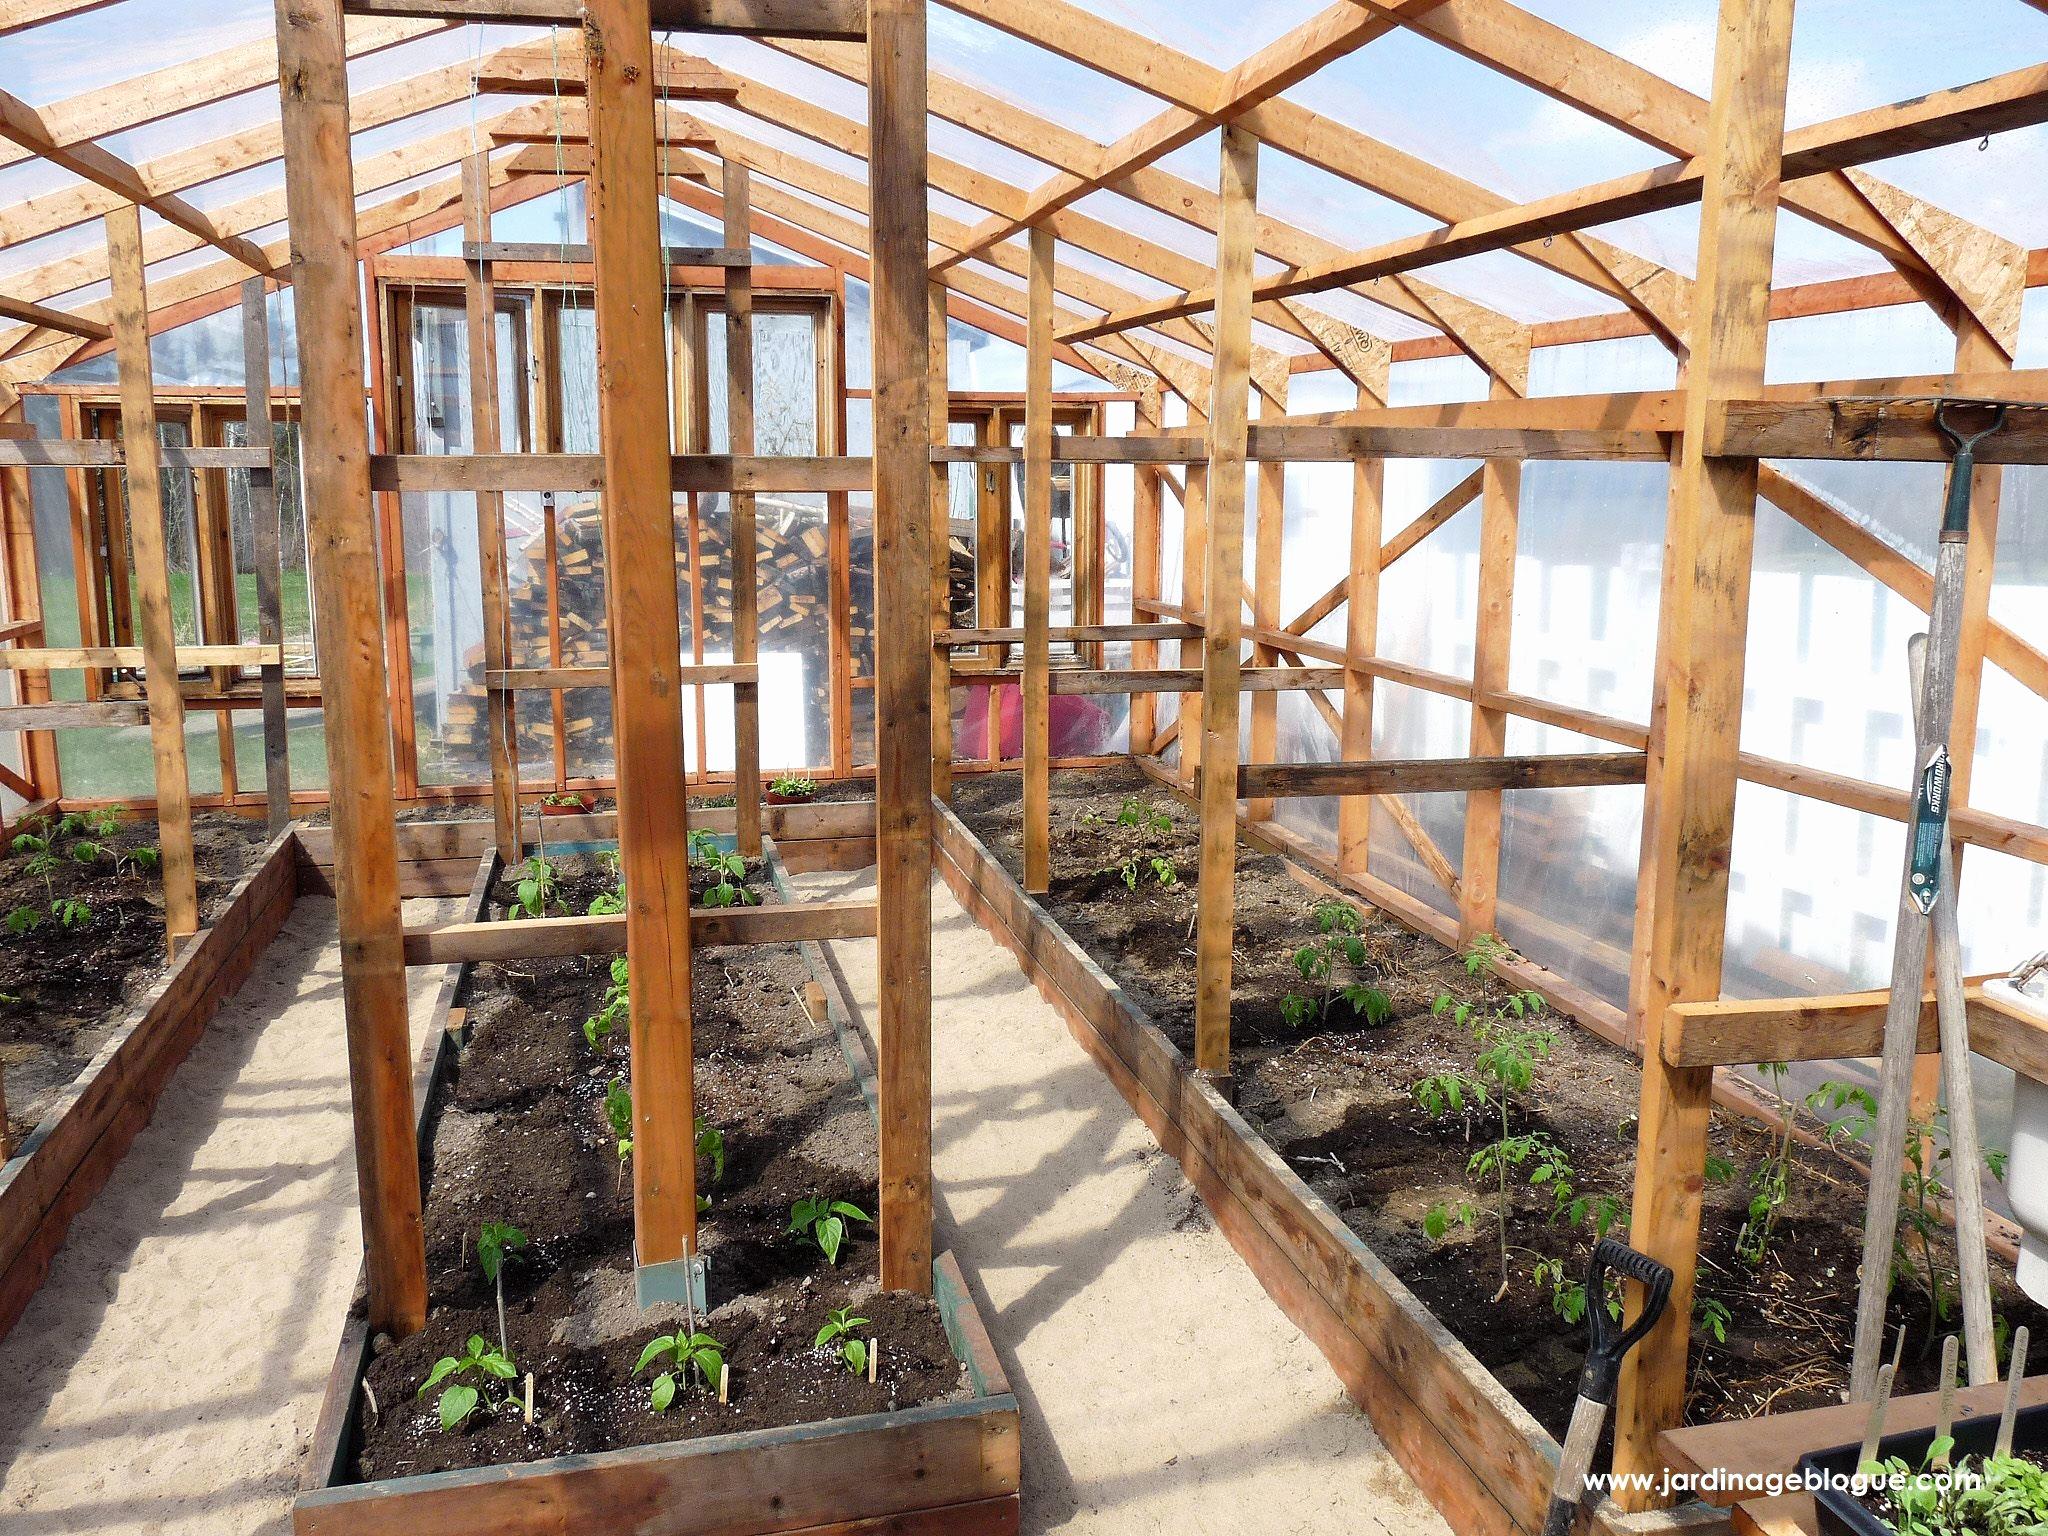 Fabriquer Serre De Jardin Polycarbonate Élégant Images Acheter Serre Jardin élégant Fabriquer Serre De Jardin Polycarbonate